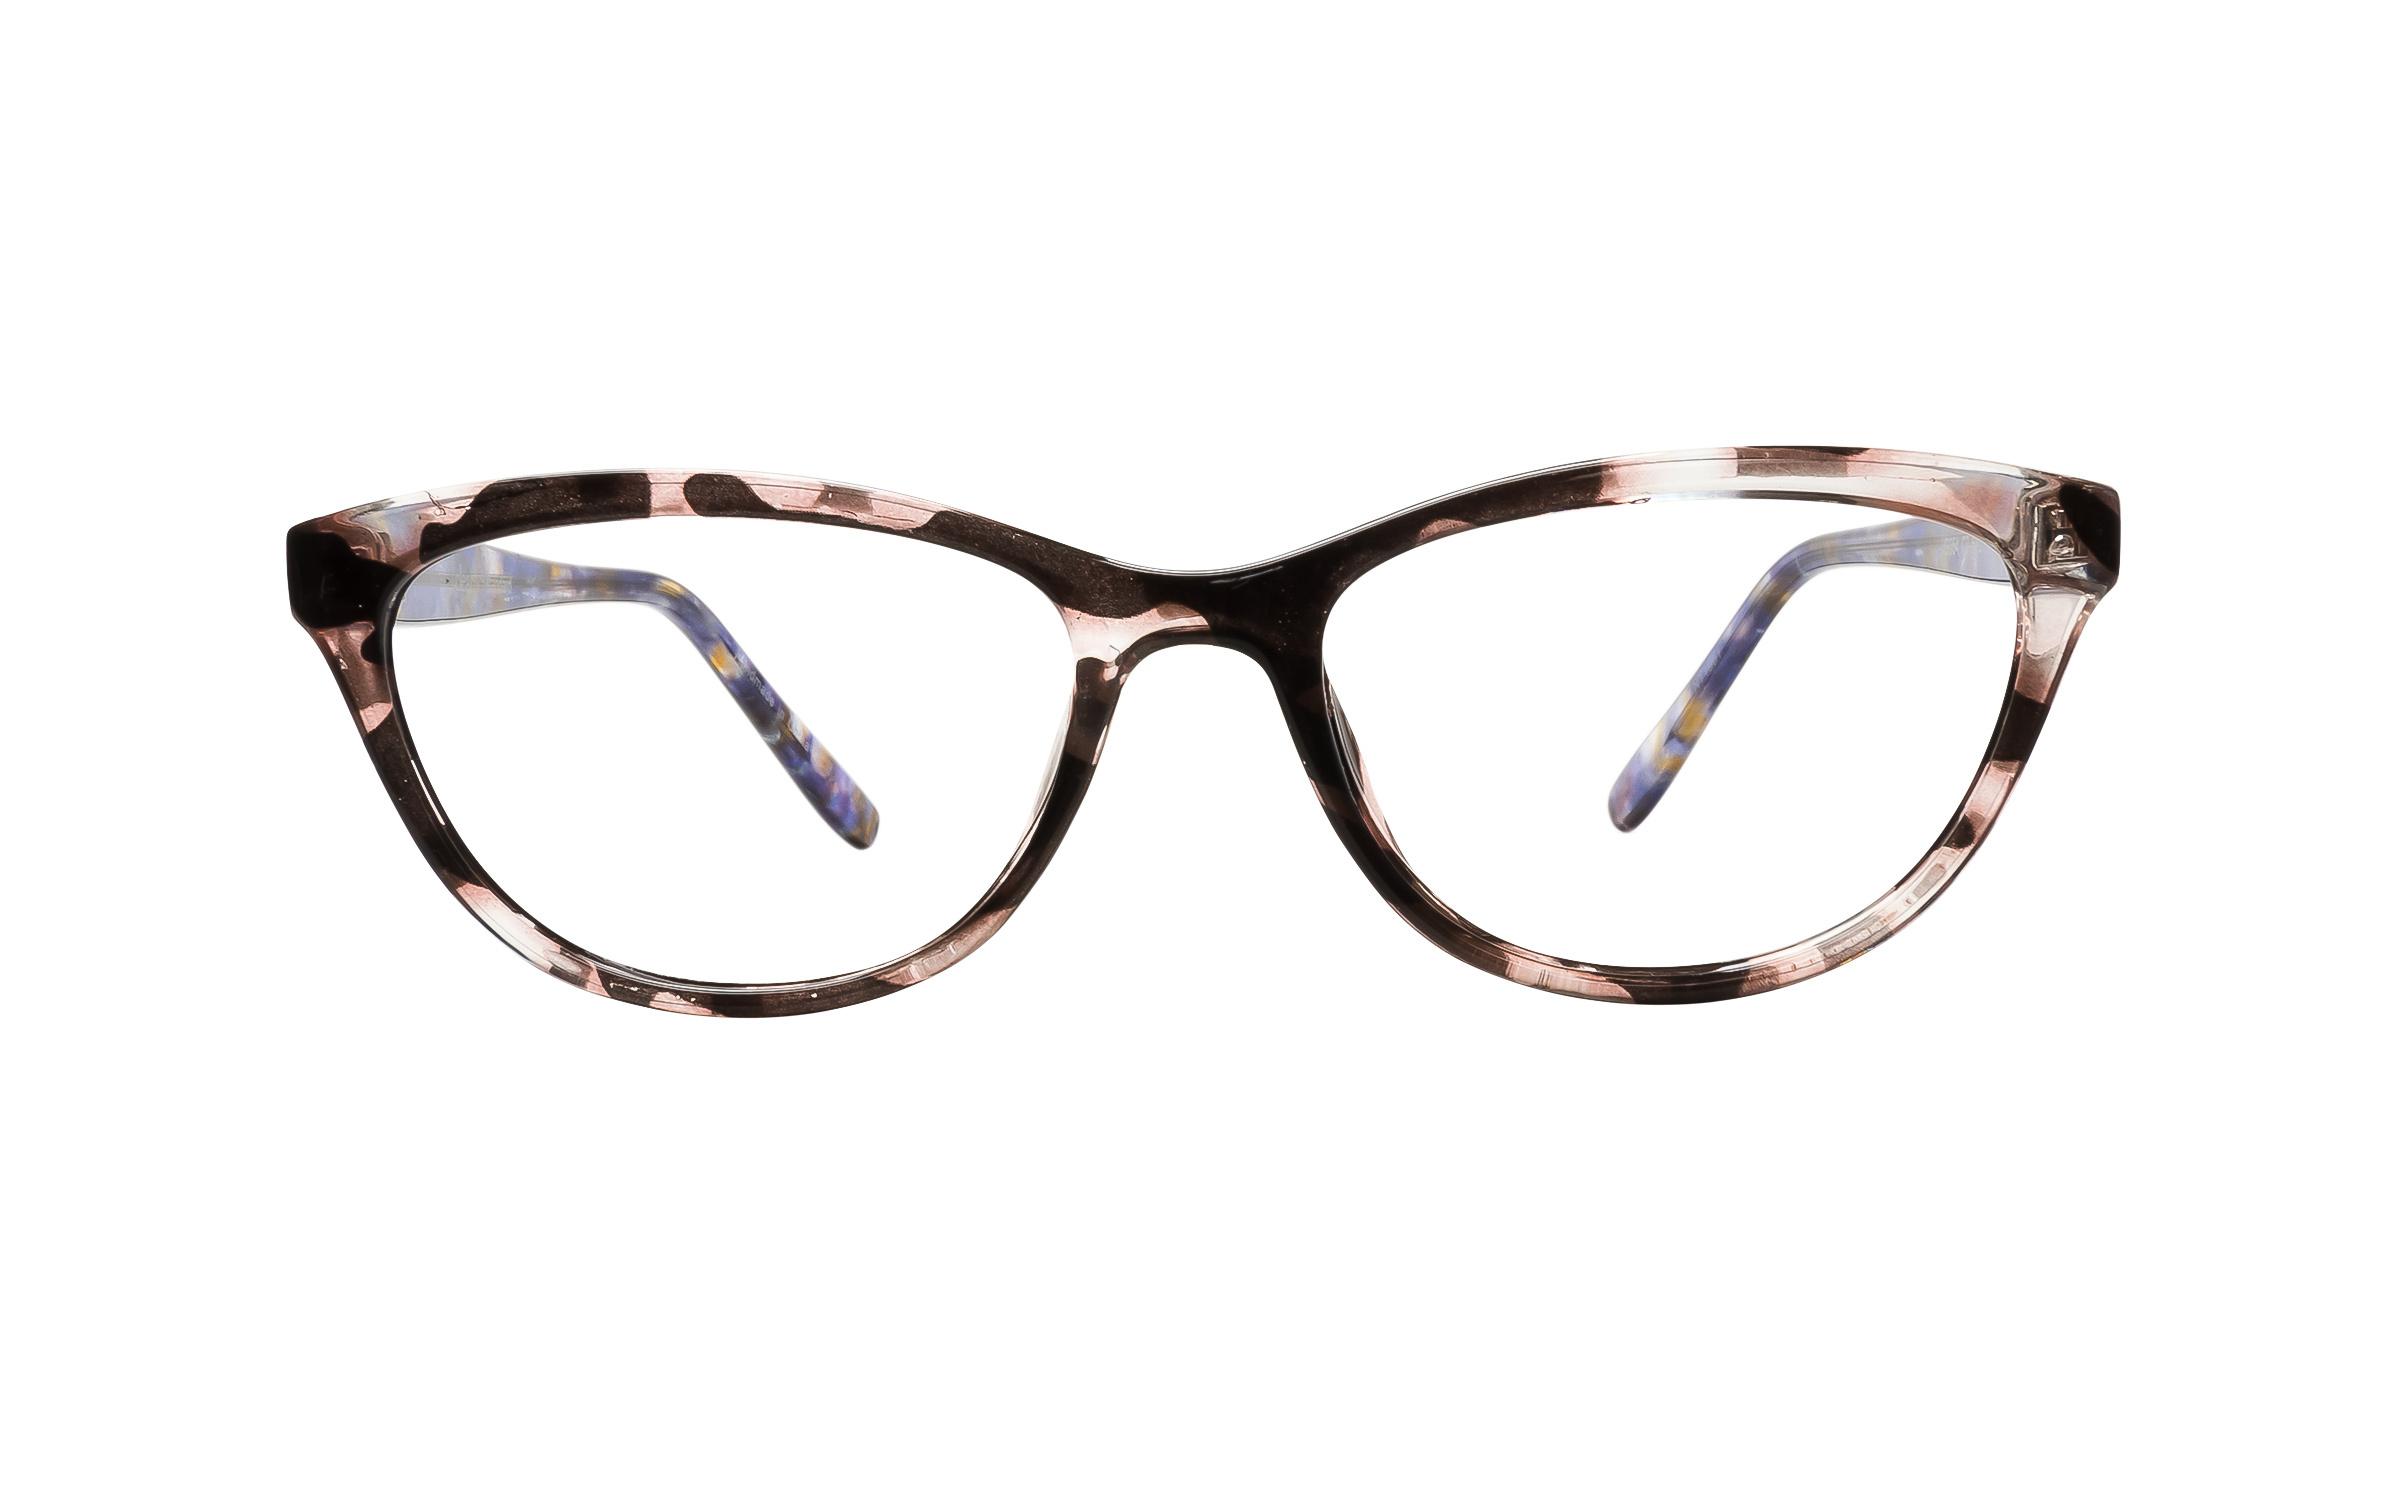 Clearly Basics Port Hope G054 C7 (52) Eyeglasses and Frame in Blush Pink/Tortoise - Online Coastal